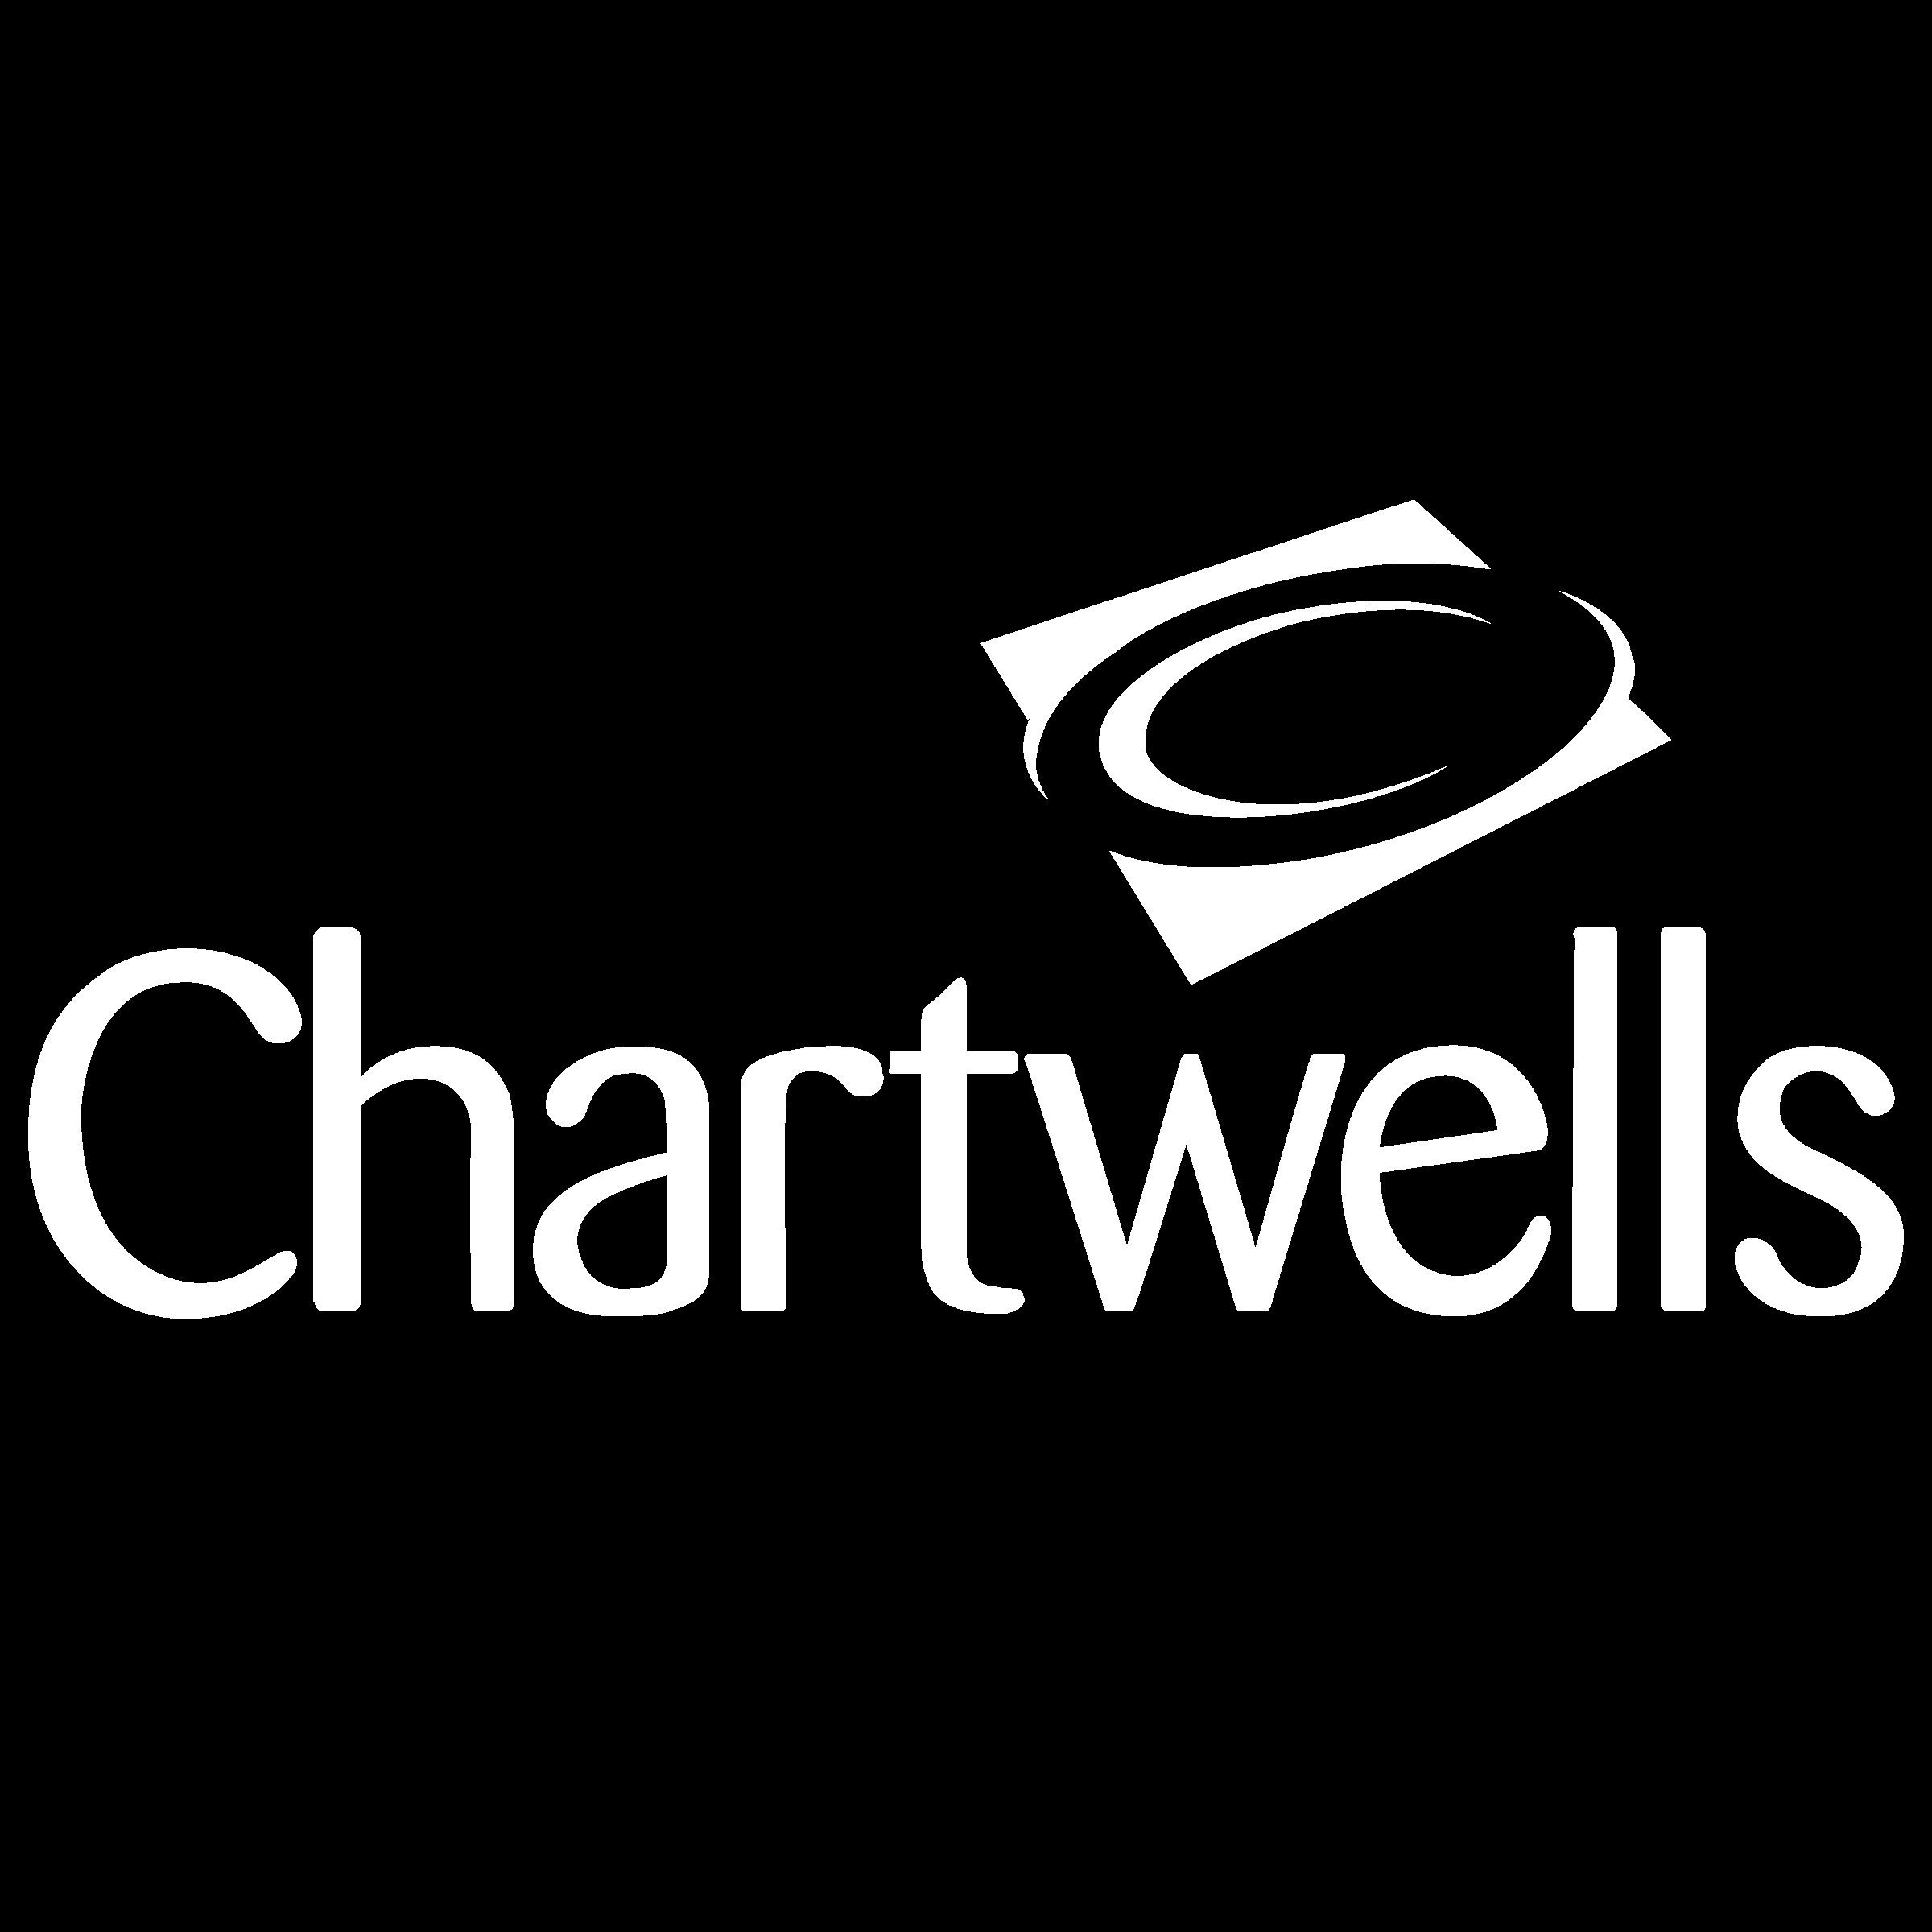 Chartwells Logo PNG Transparent & SVG Vector - Freebie Supply